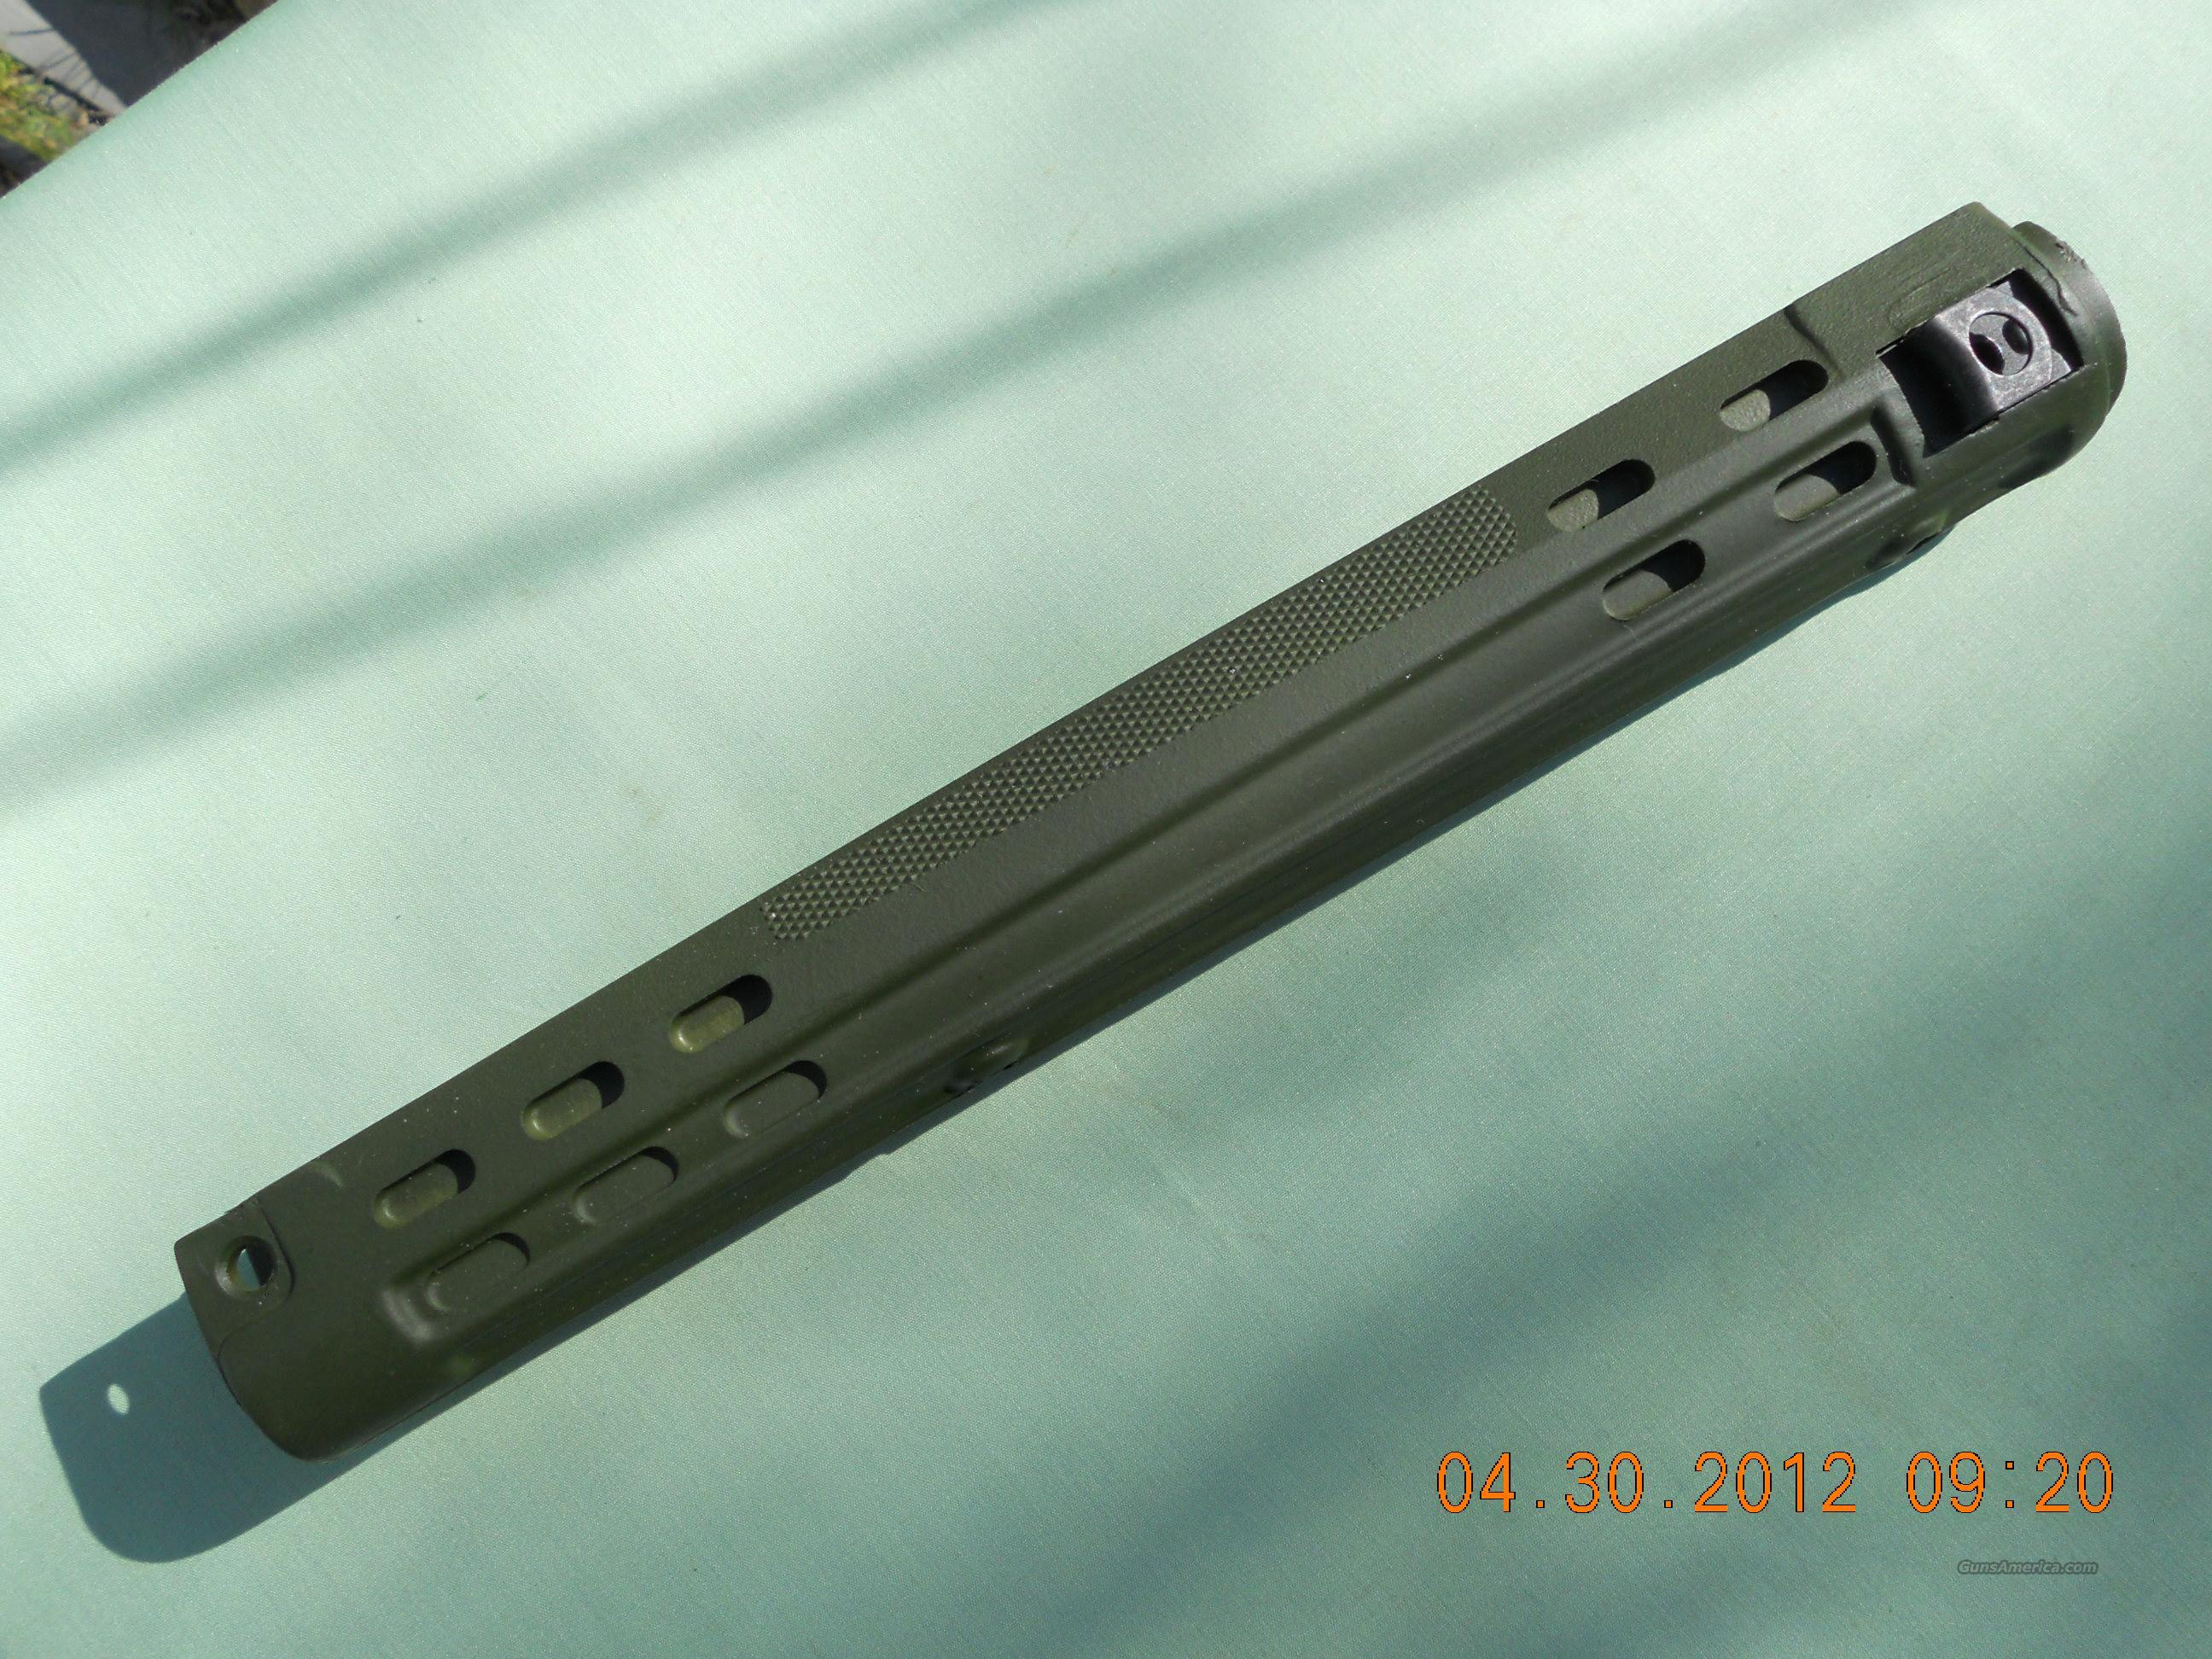 HK/G3 PTR91  - GREEN SLIM LINE WEST GERMAN FOREND  Non-Guns > Gun Parts > Military - Foreign